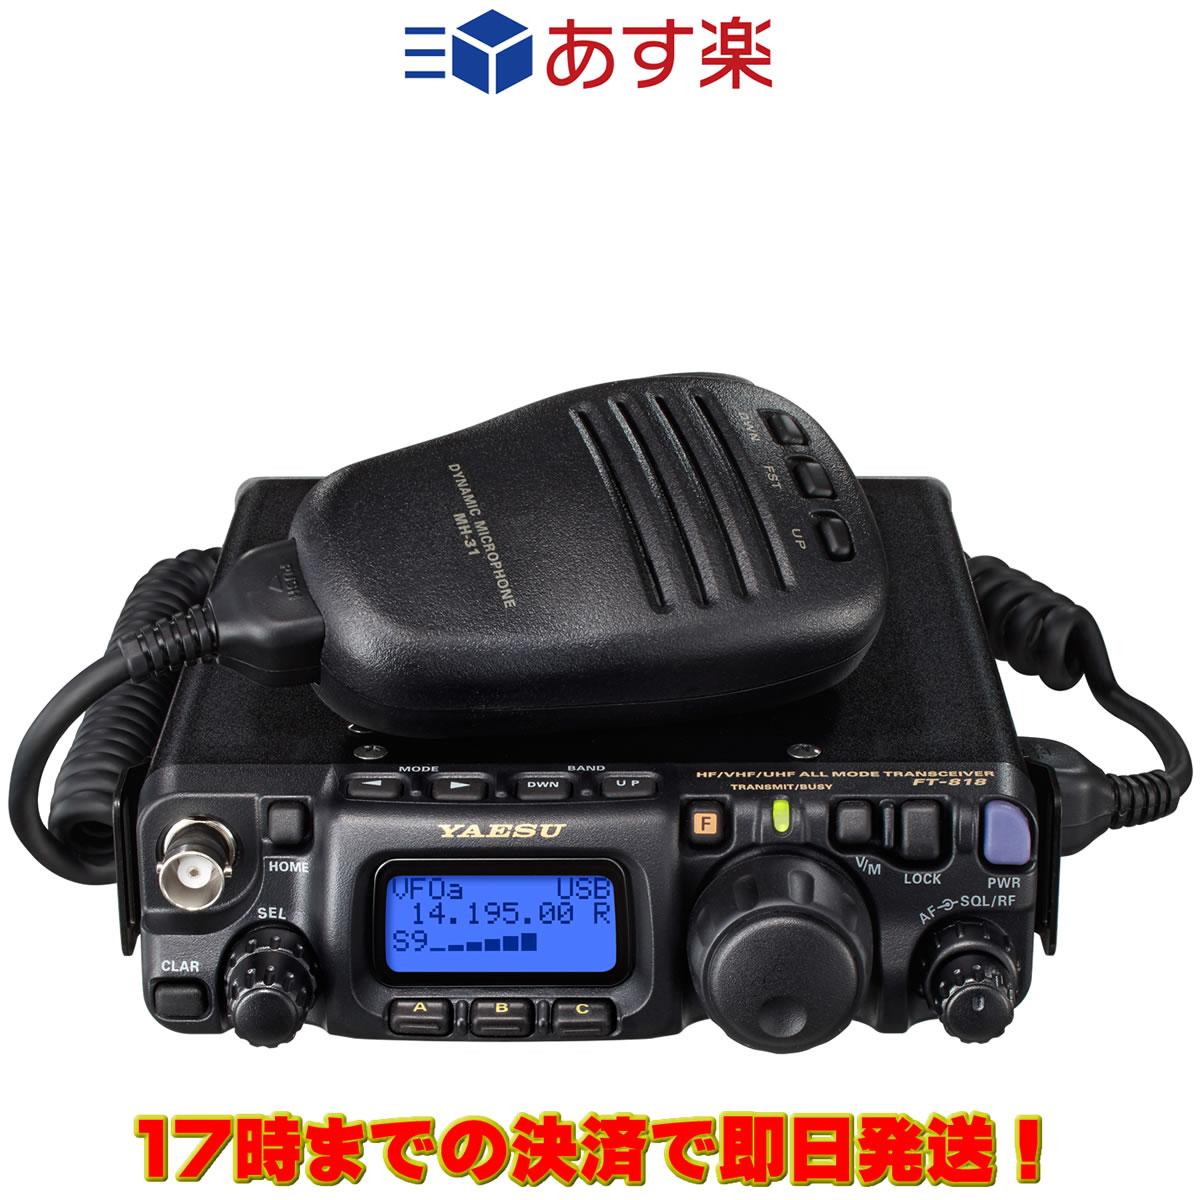 FT-818ND 八重洲無線 HF/50/144/430MHz帯オールモードトランシーバー